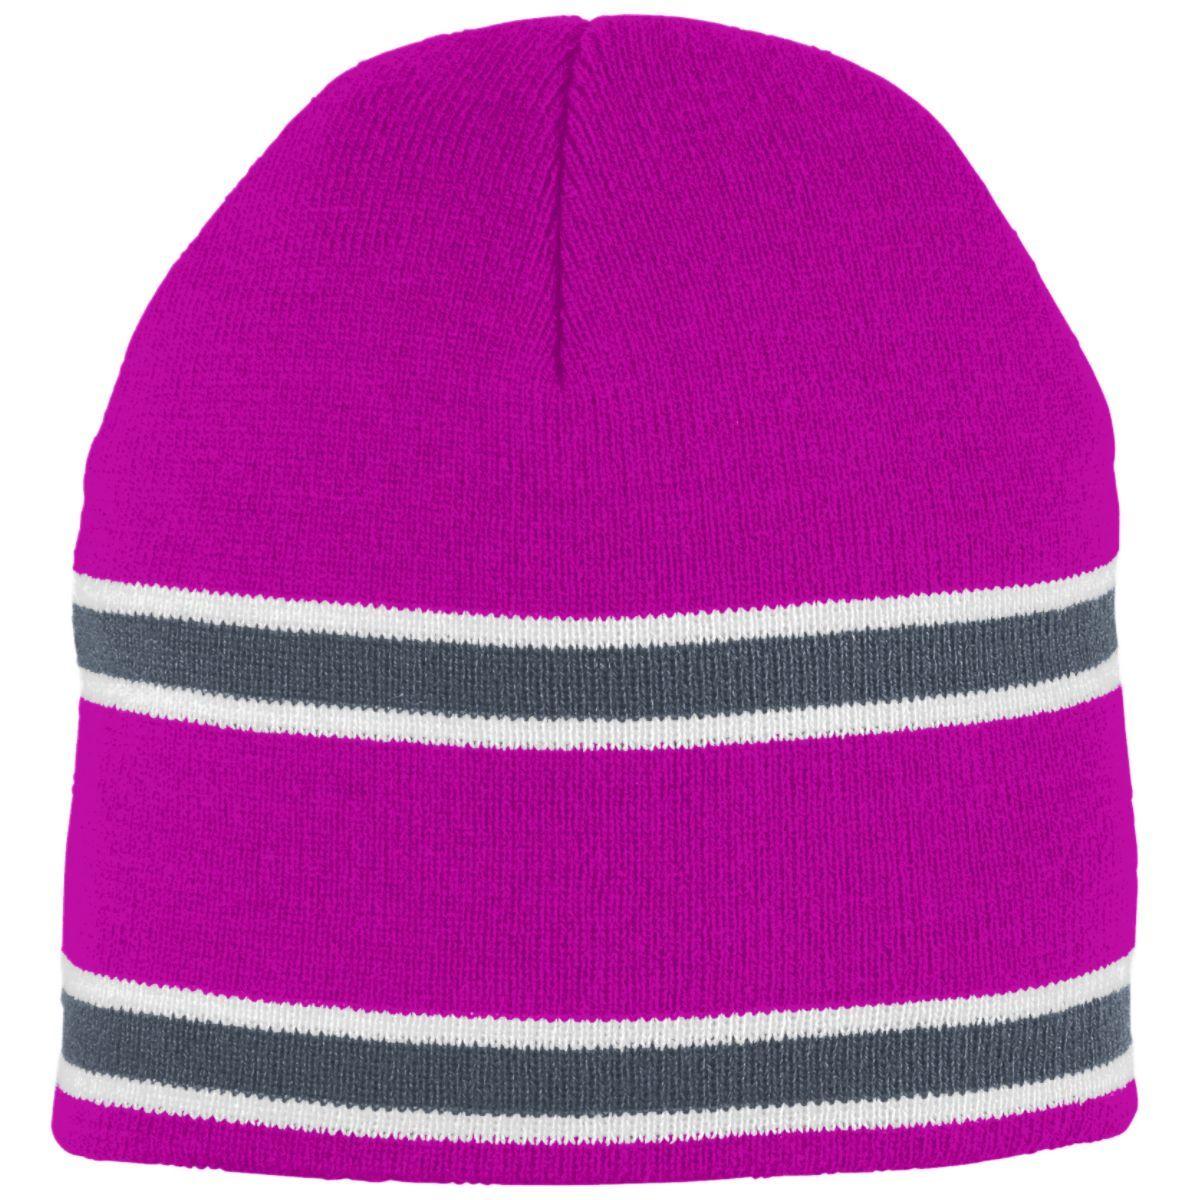 Striped Knit Beanie - POWER PINK/GRAPHITE/WHITE